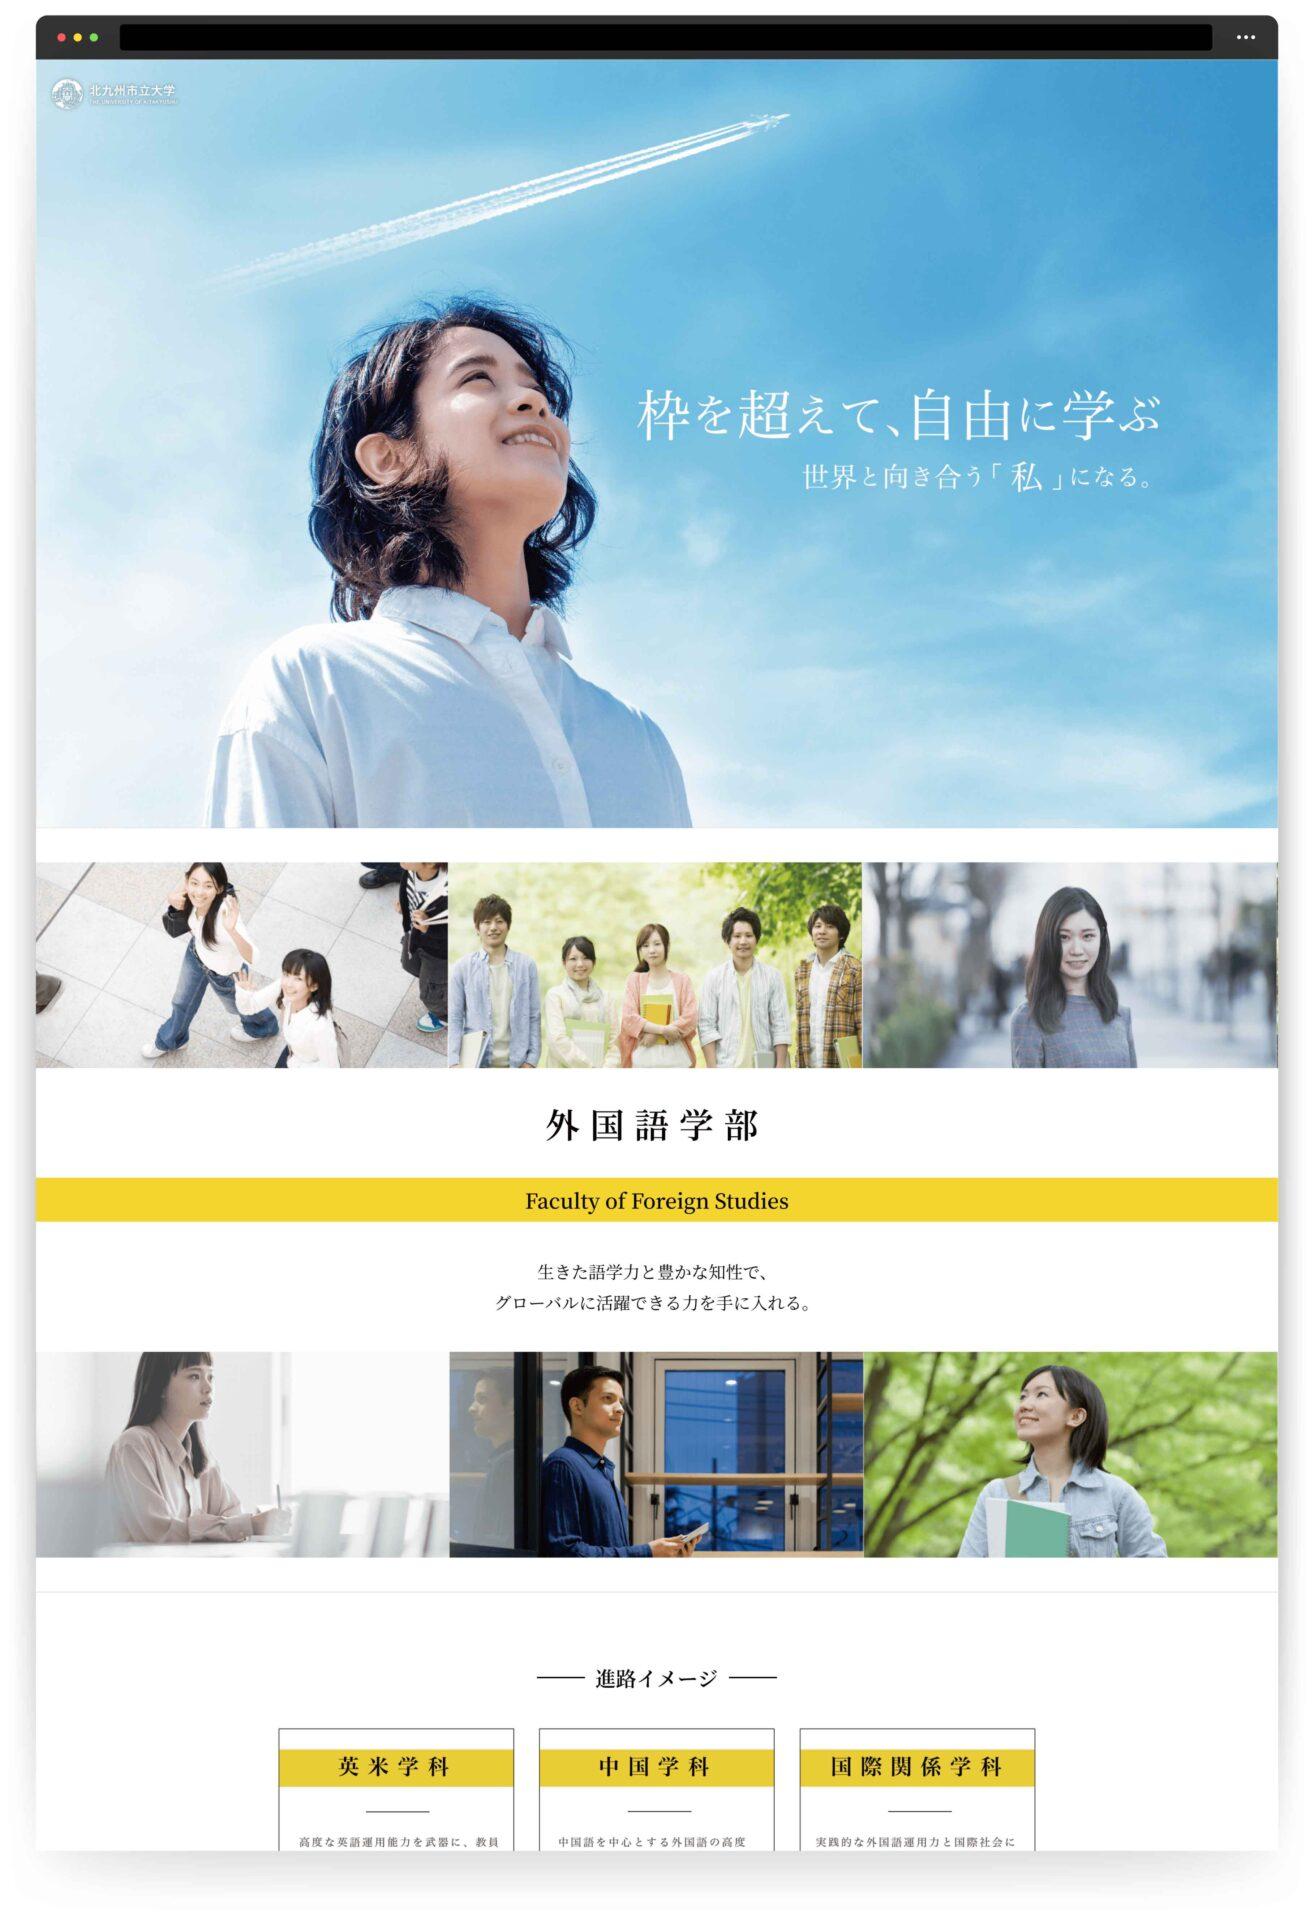 「KITAKYUSYU ICHIRITSU COLLEDGE OPENCAMPAS」の実績画像